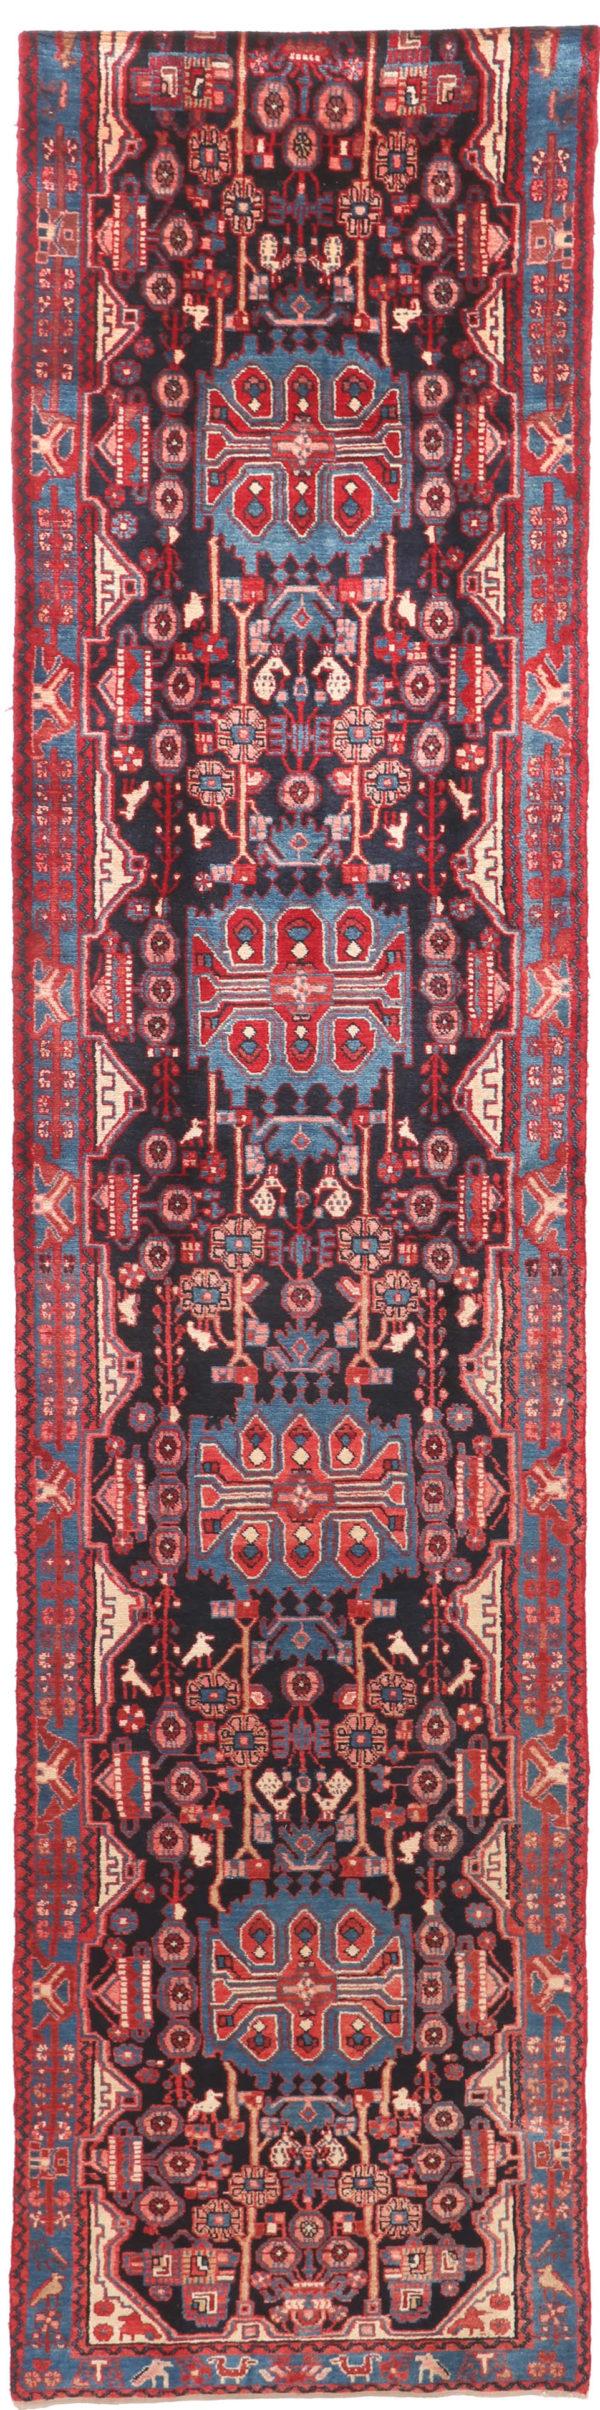 335701 Nahavand Persian Good Pile Circa 1970 Size 477 X 102 Cm 1 600x2410